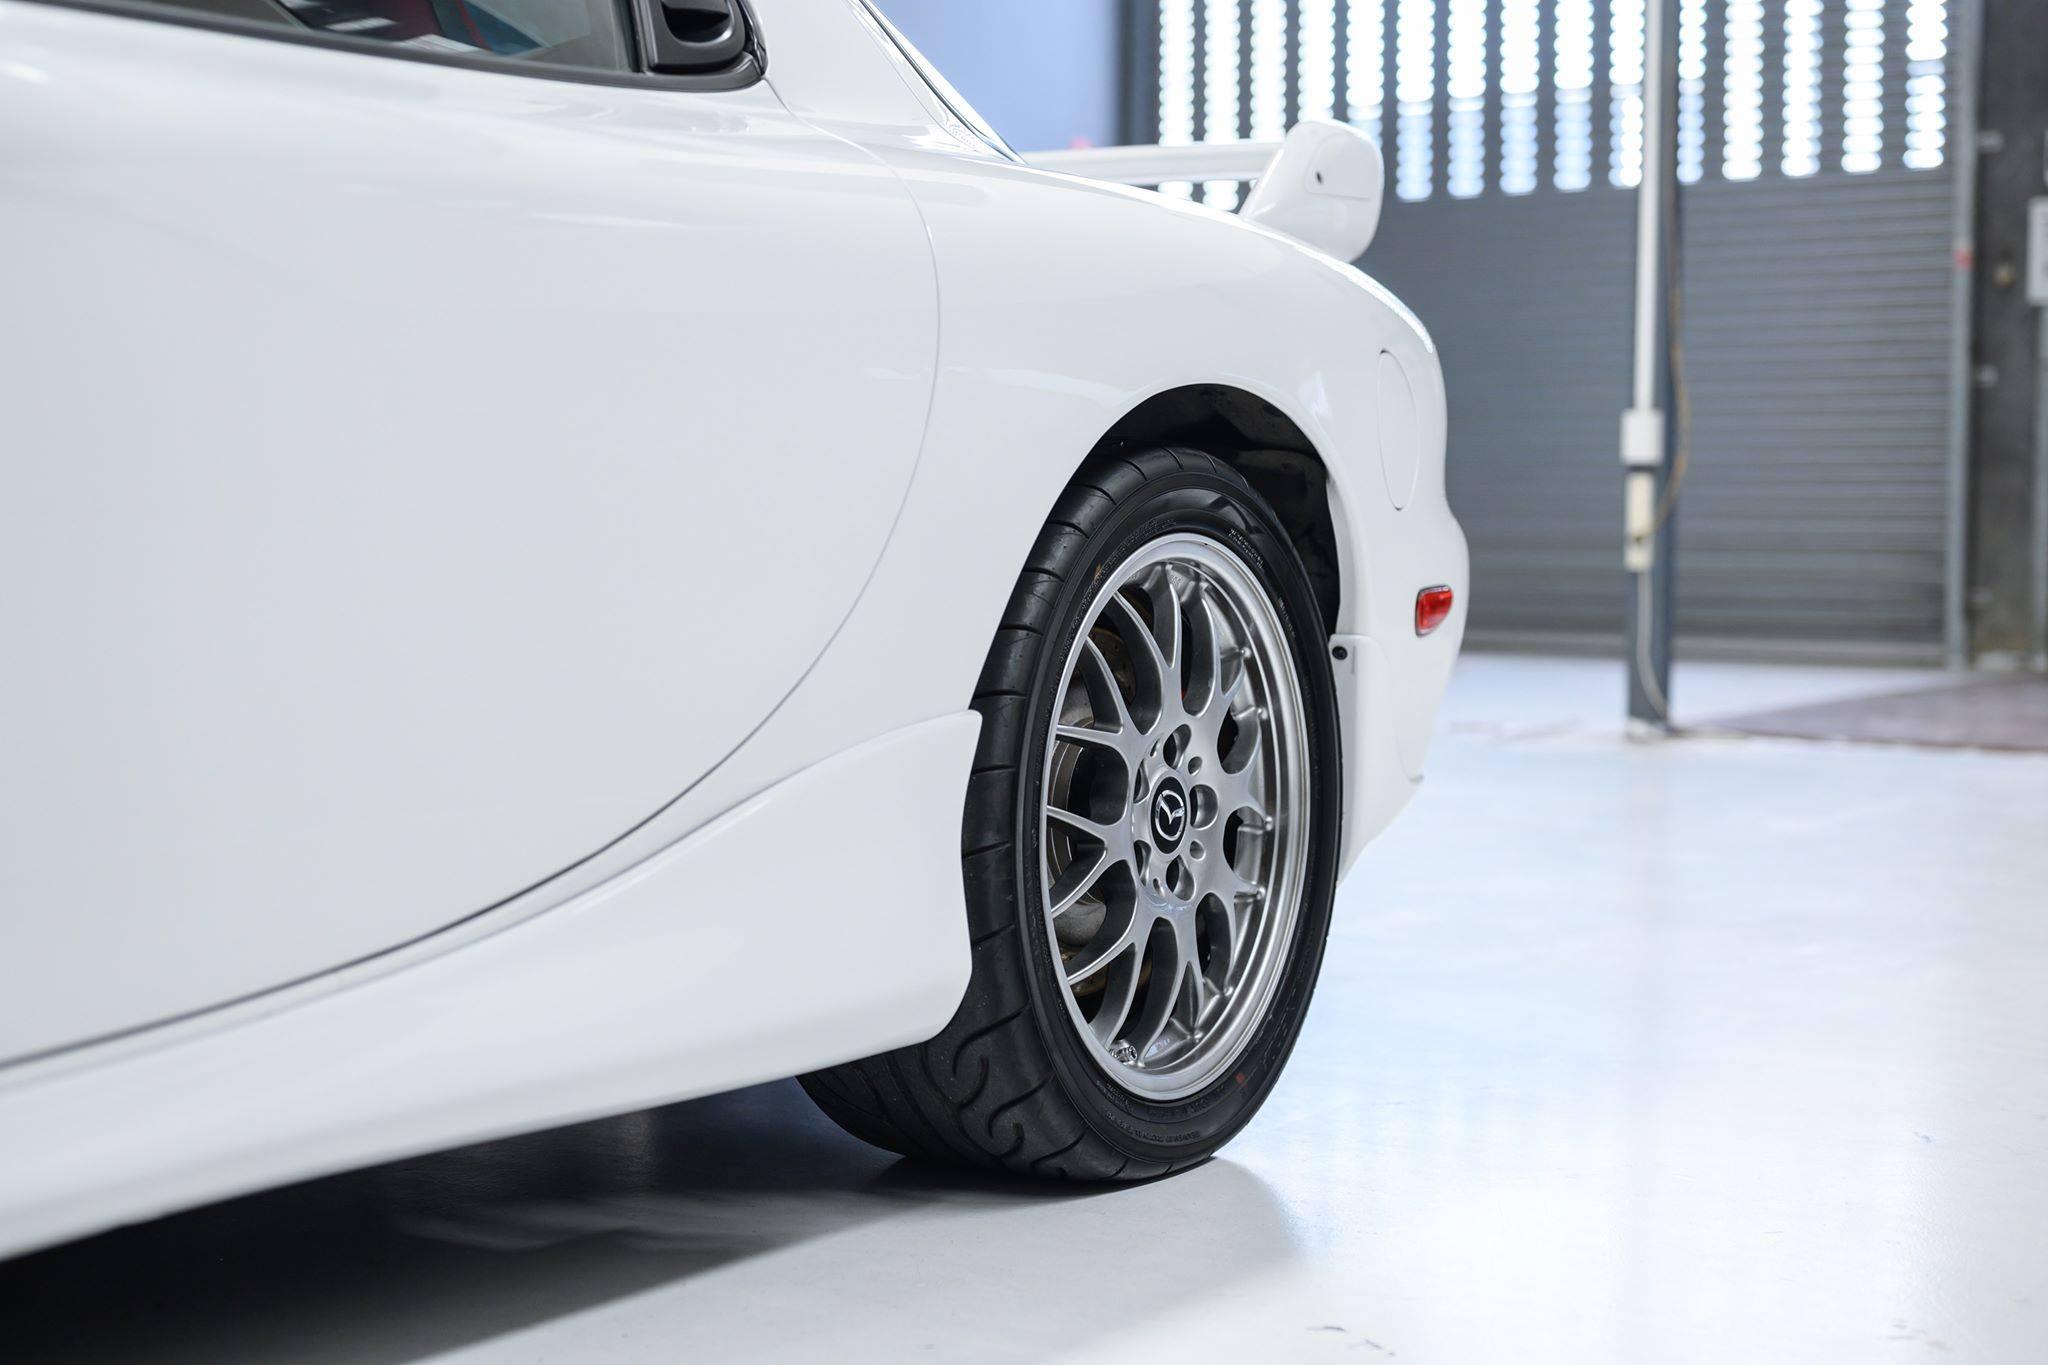 2002_Mazda_RX-7_Spirit-R_Type-A_sale_0004